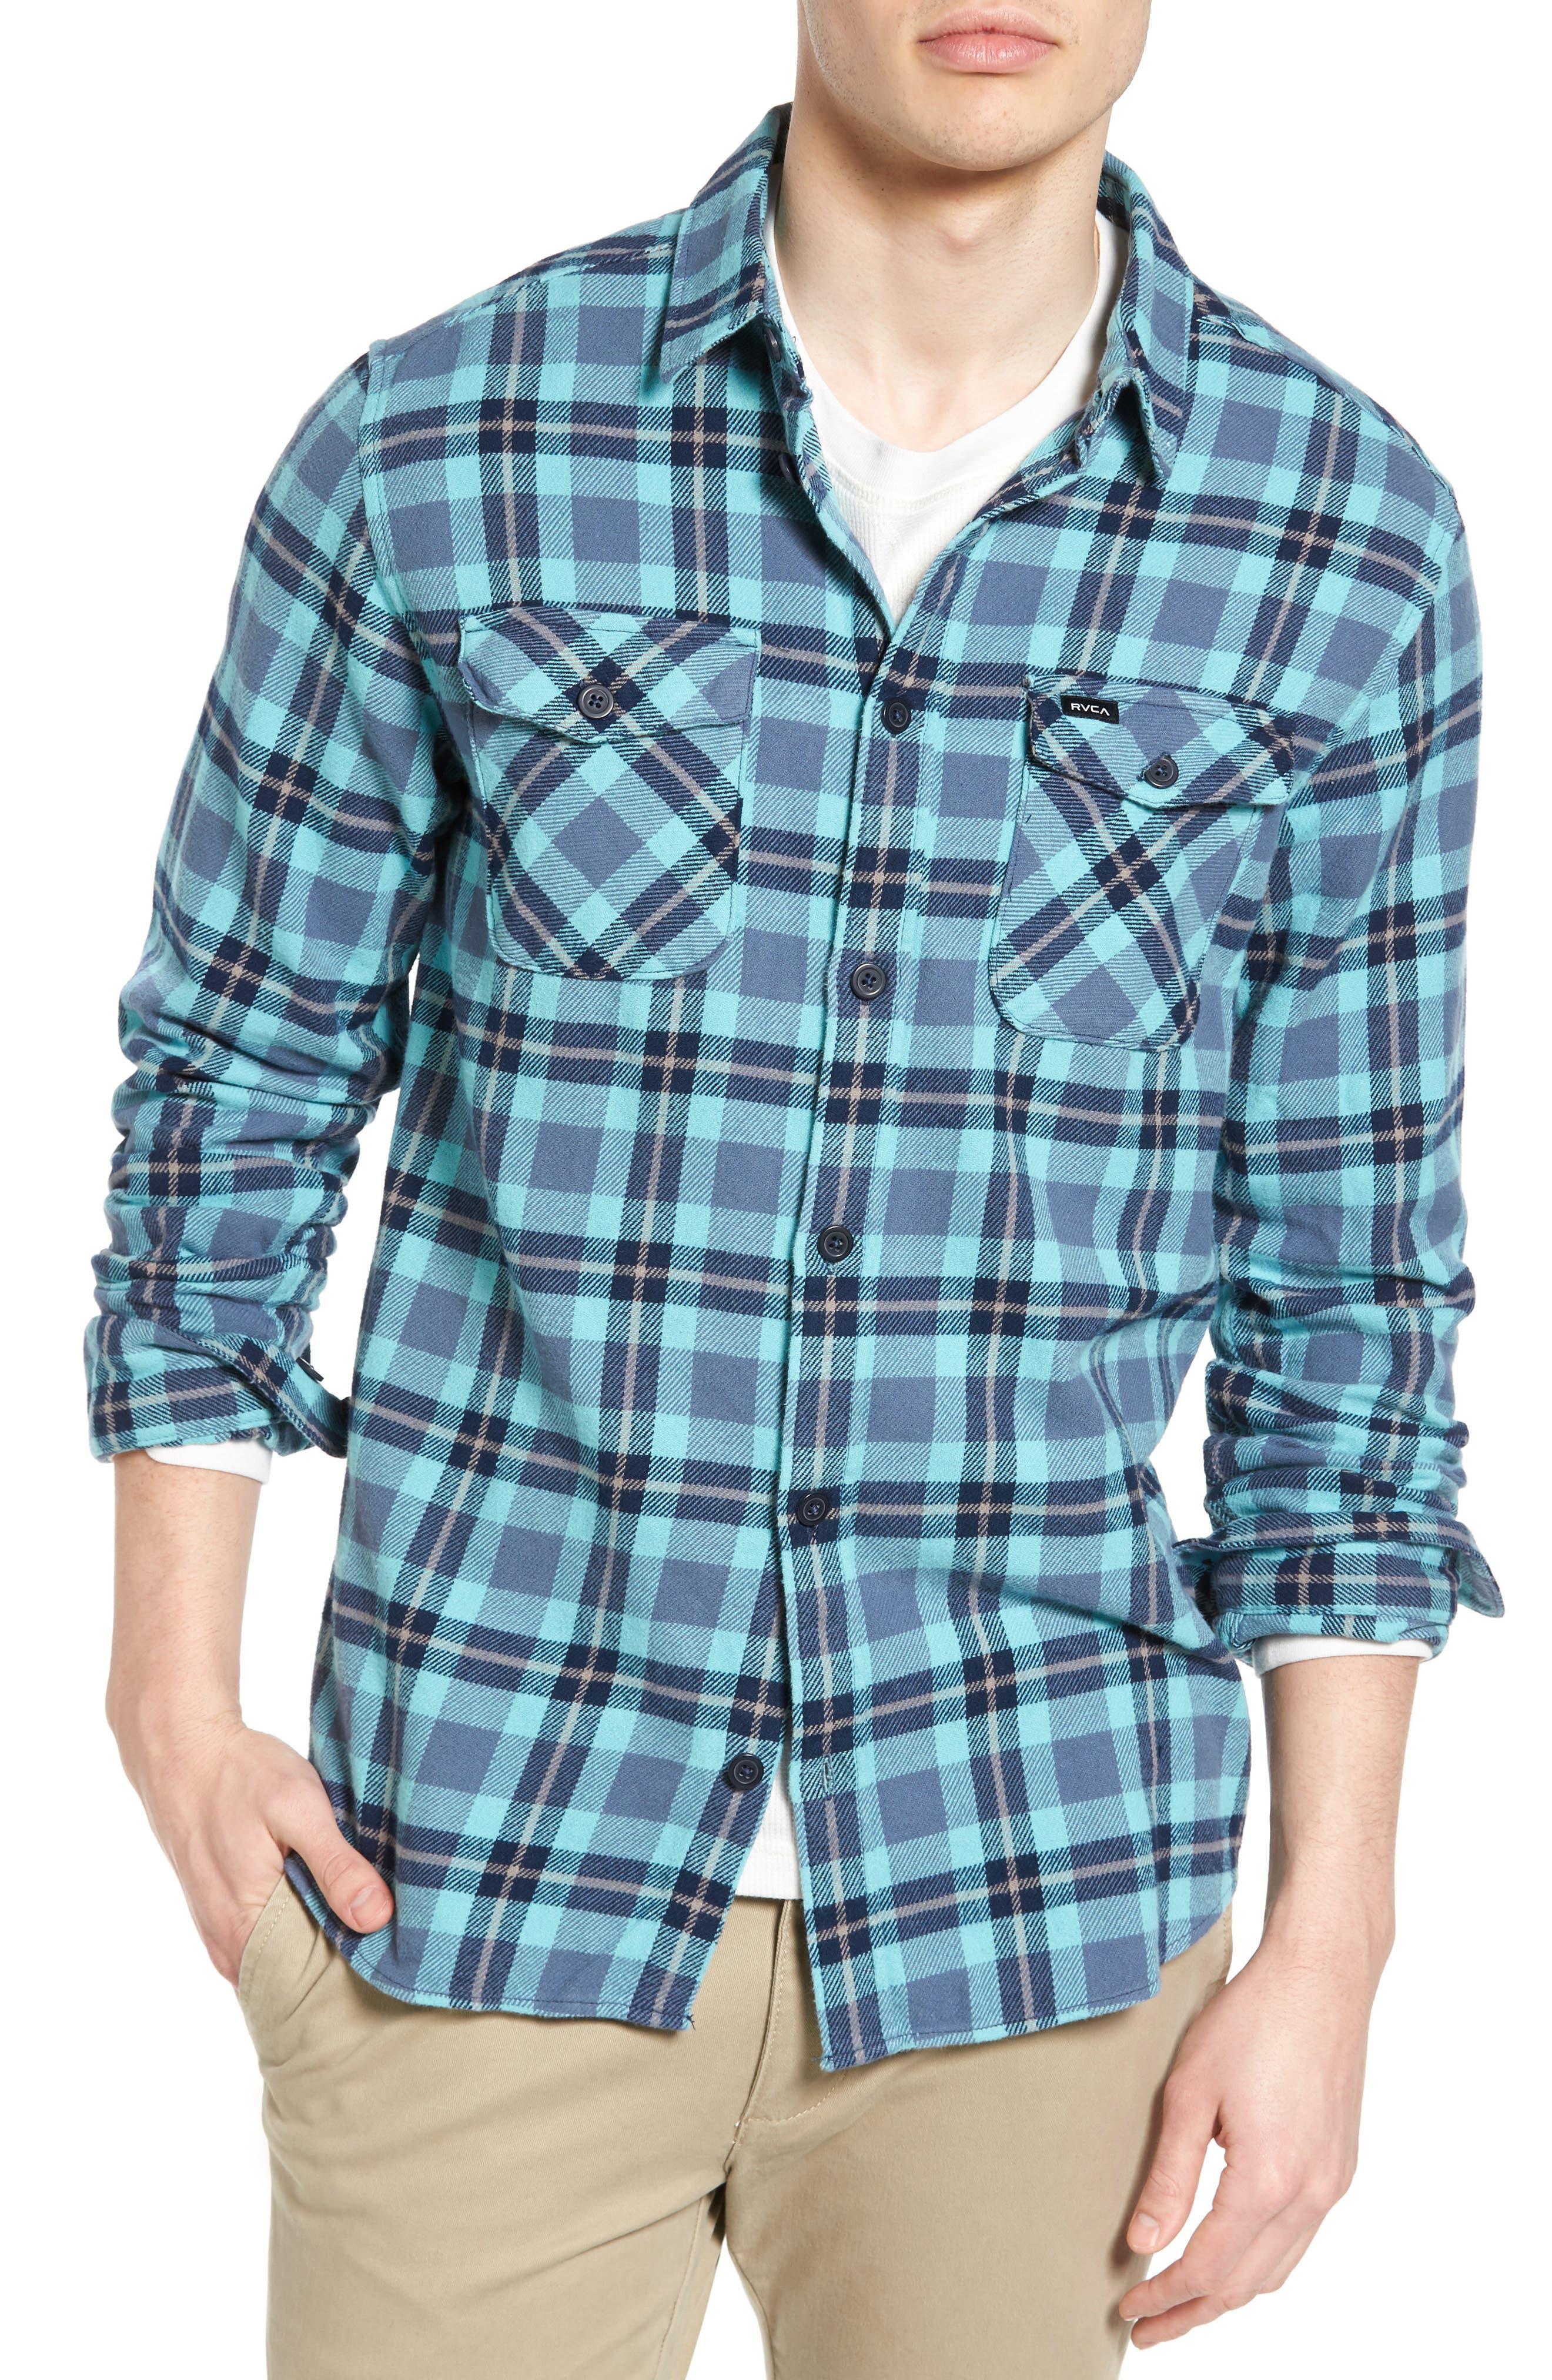 'That'll Work' Trim Fit Plaid Flannel Shirt,                             Main thumbnail 6, color,